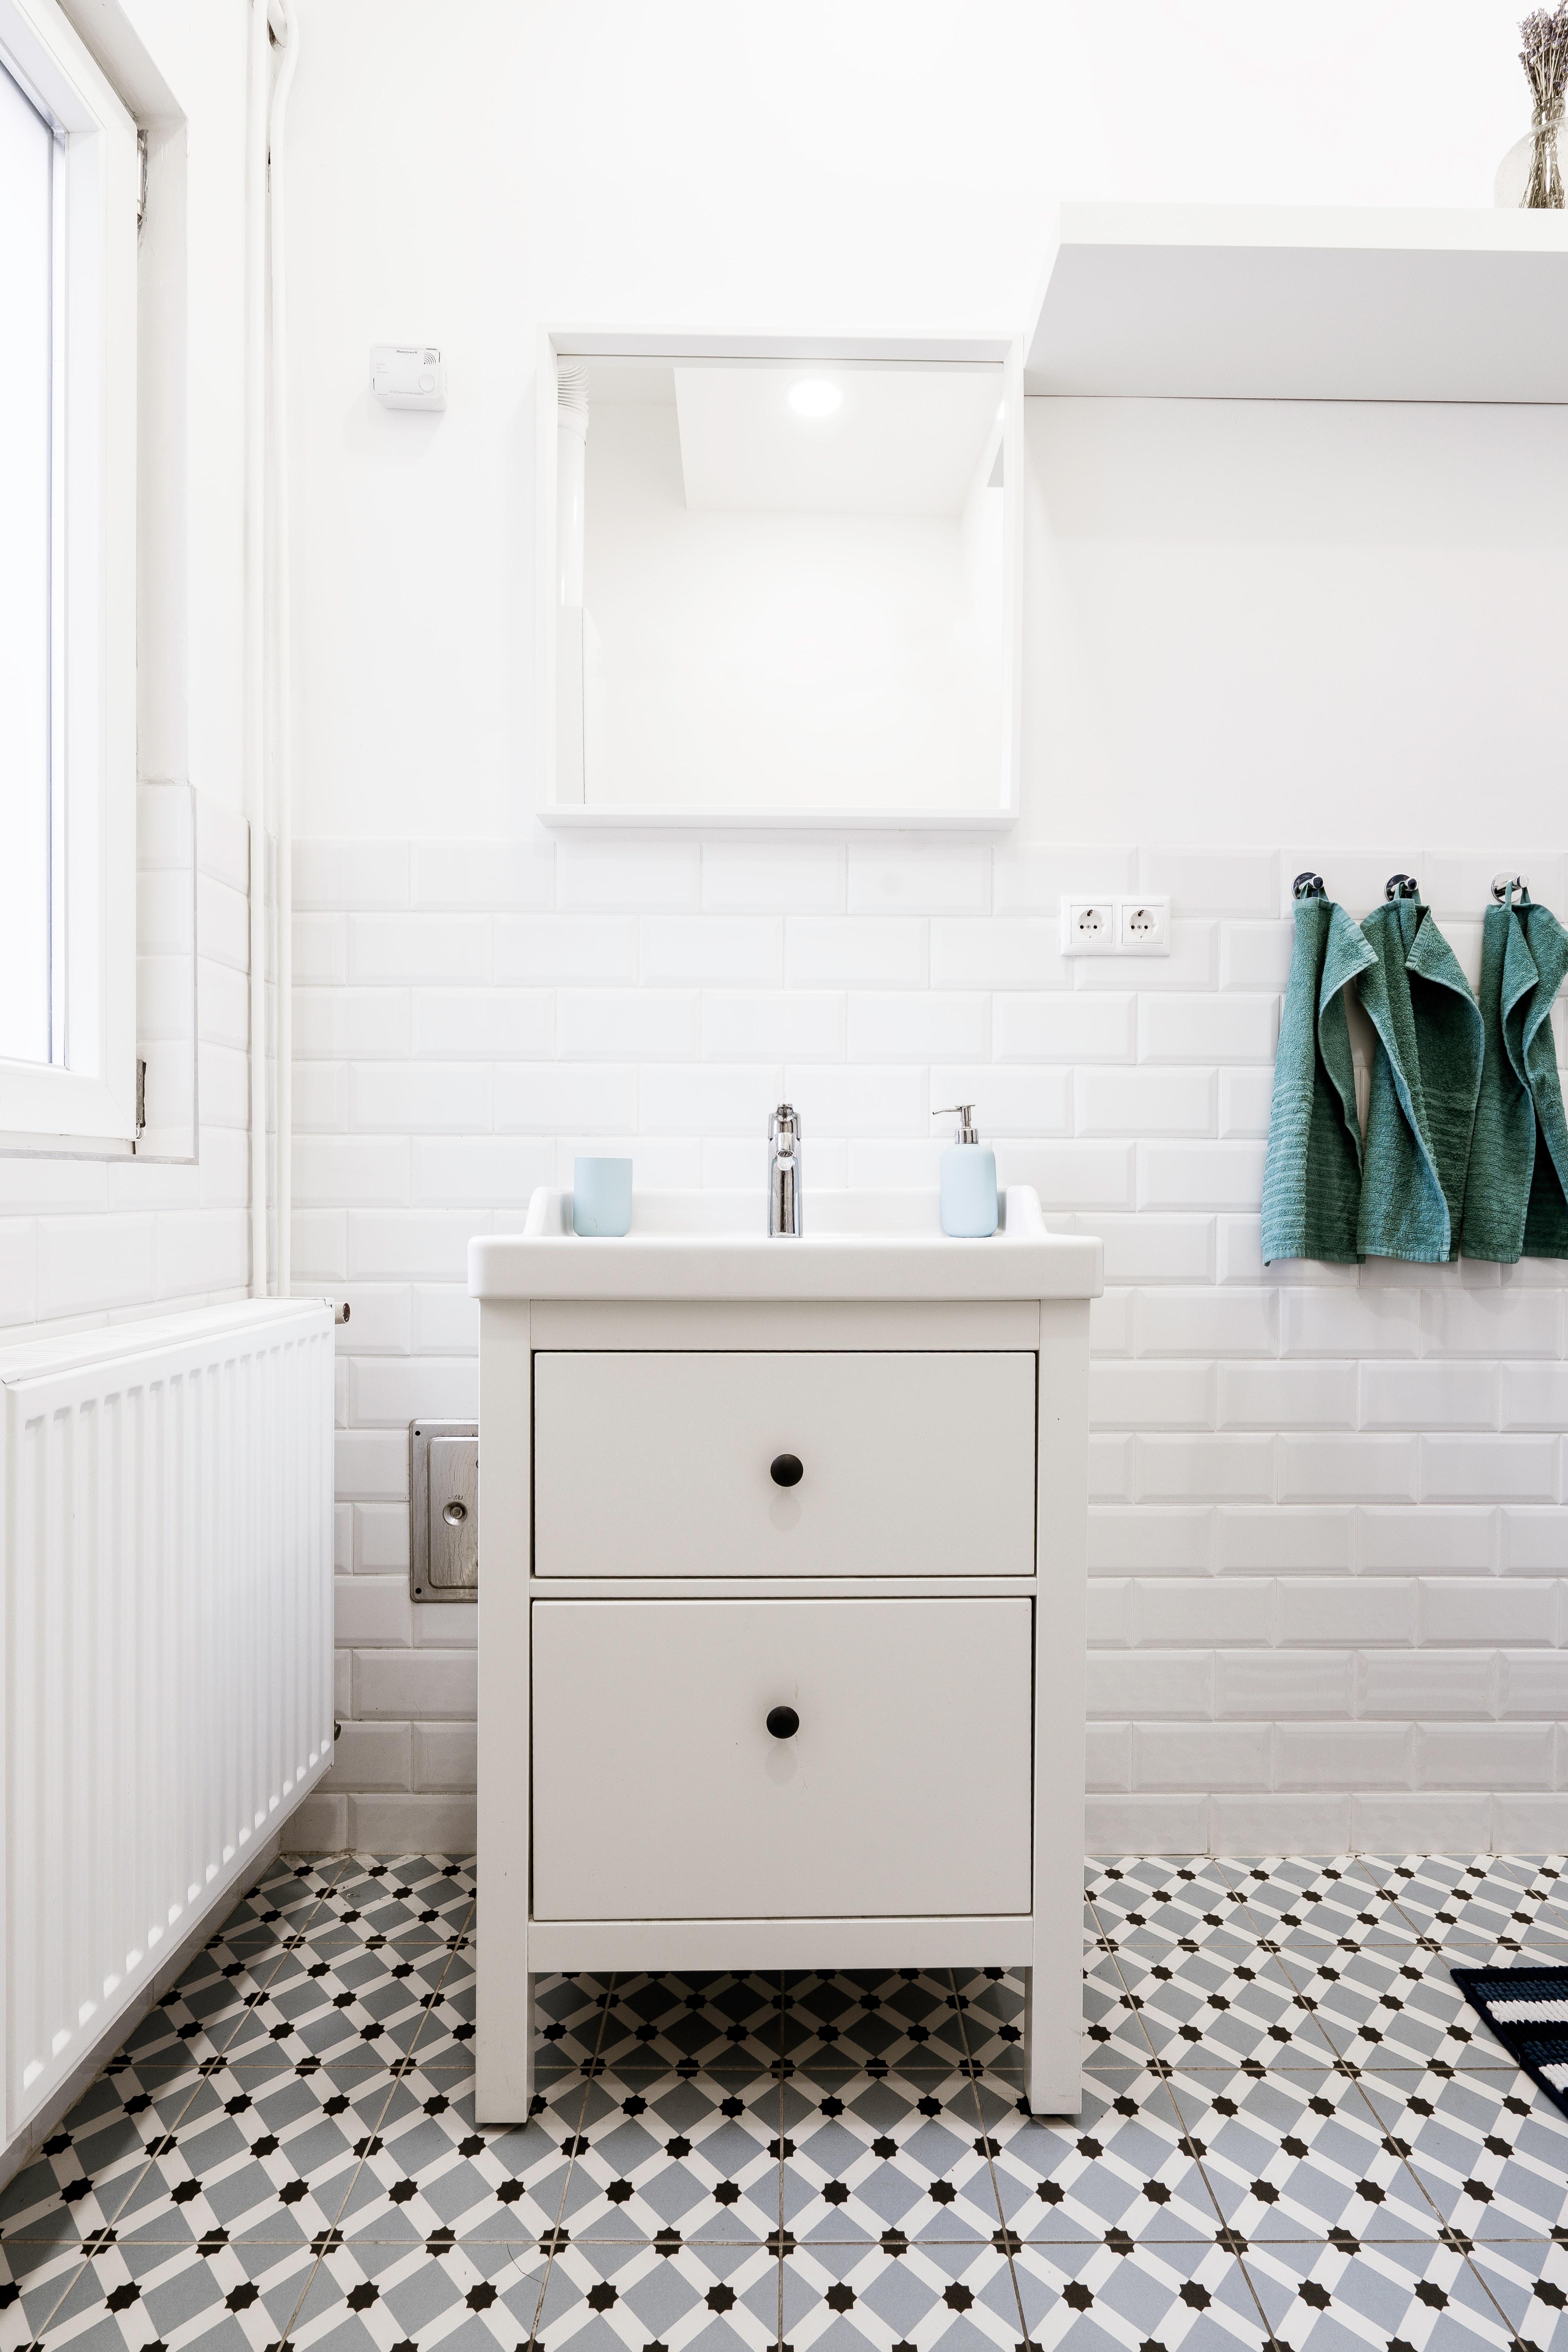 Best Flooring For Bathroom Remodel December 2019